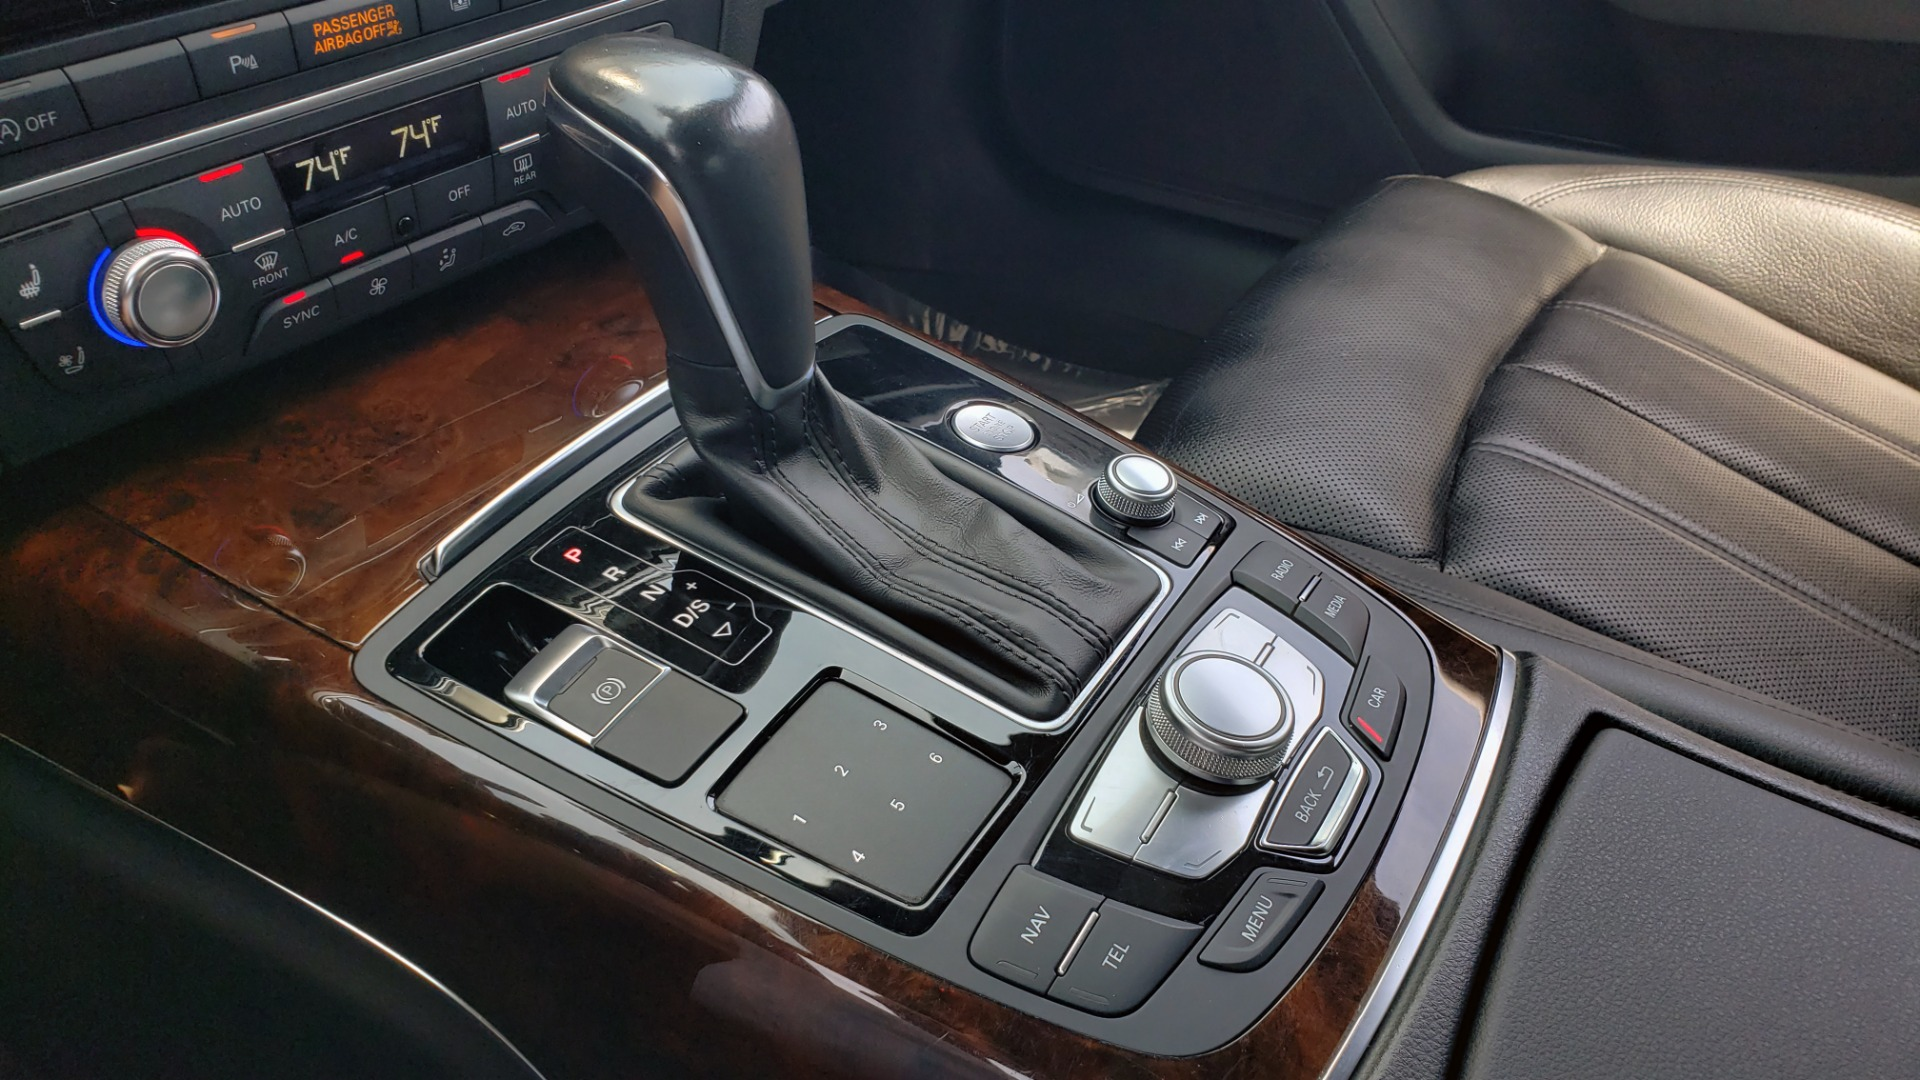 Used 2017 Audi A6 PRESTIGE SEDAN 3.0T / NAV / SUNROOF / BLACK OPTIC / CLD WTHR / REARVIEW for sale $30,797 at Formula Imports in Charlotte NC 28227 52